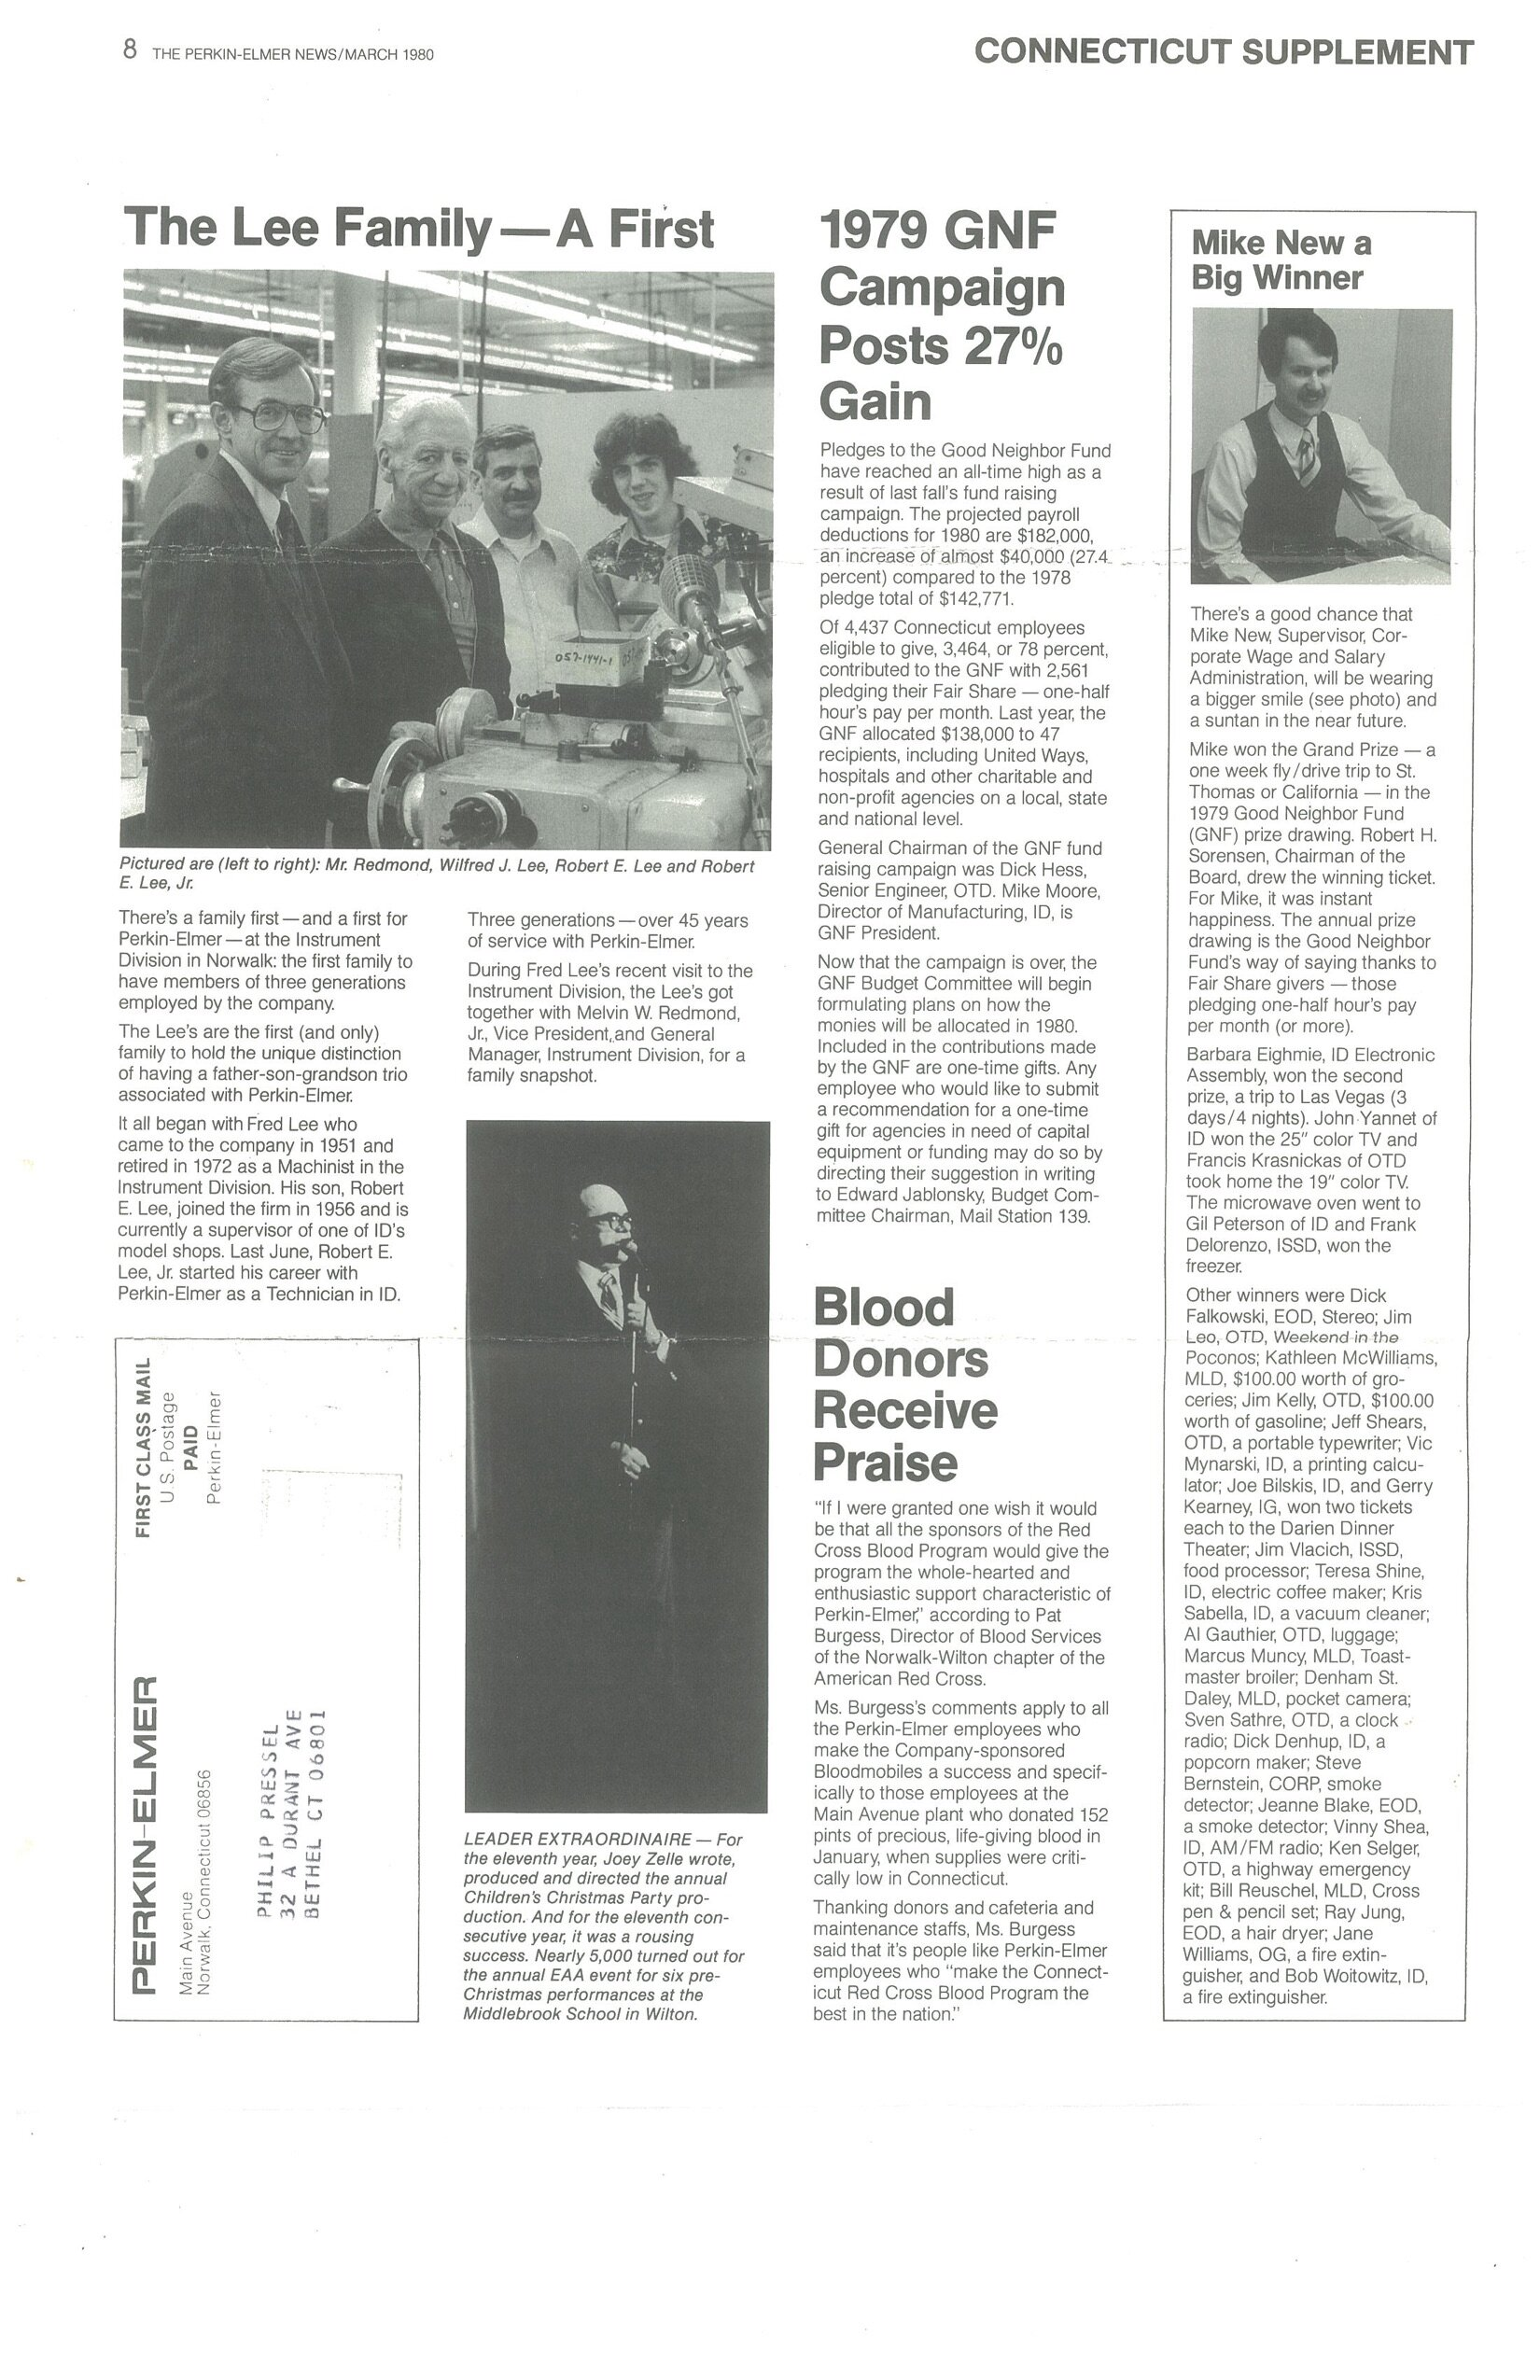 vol 23 num 1, page 8.jpg